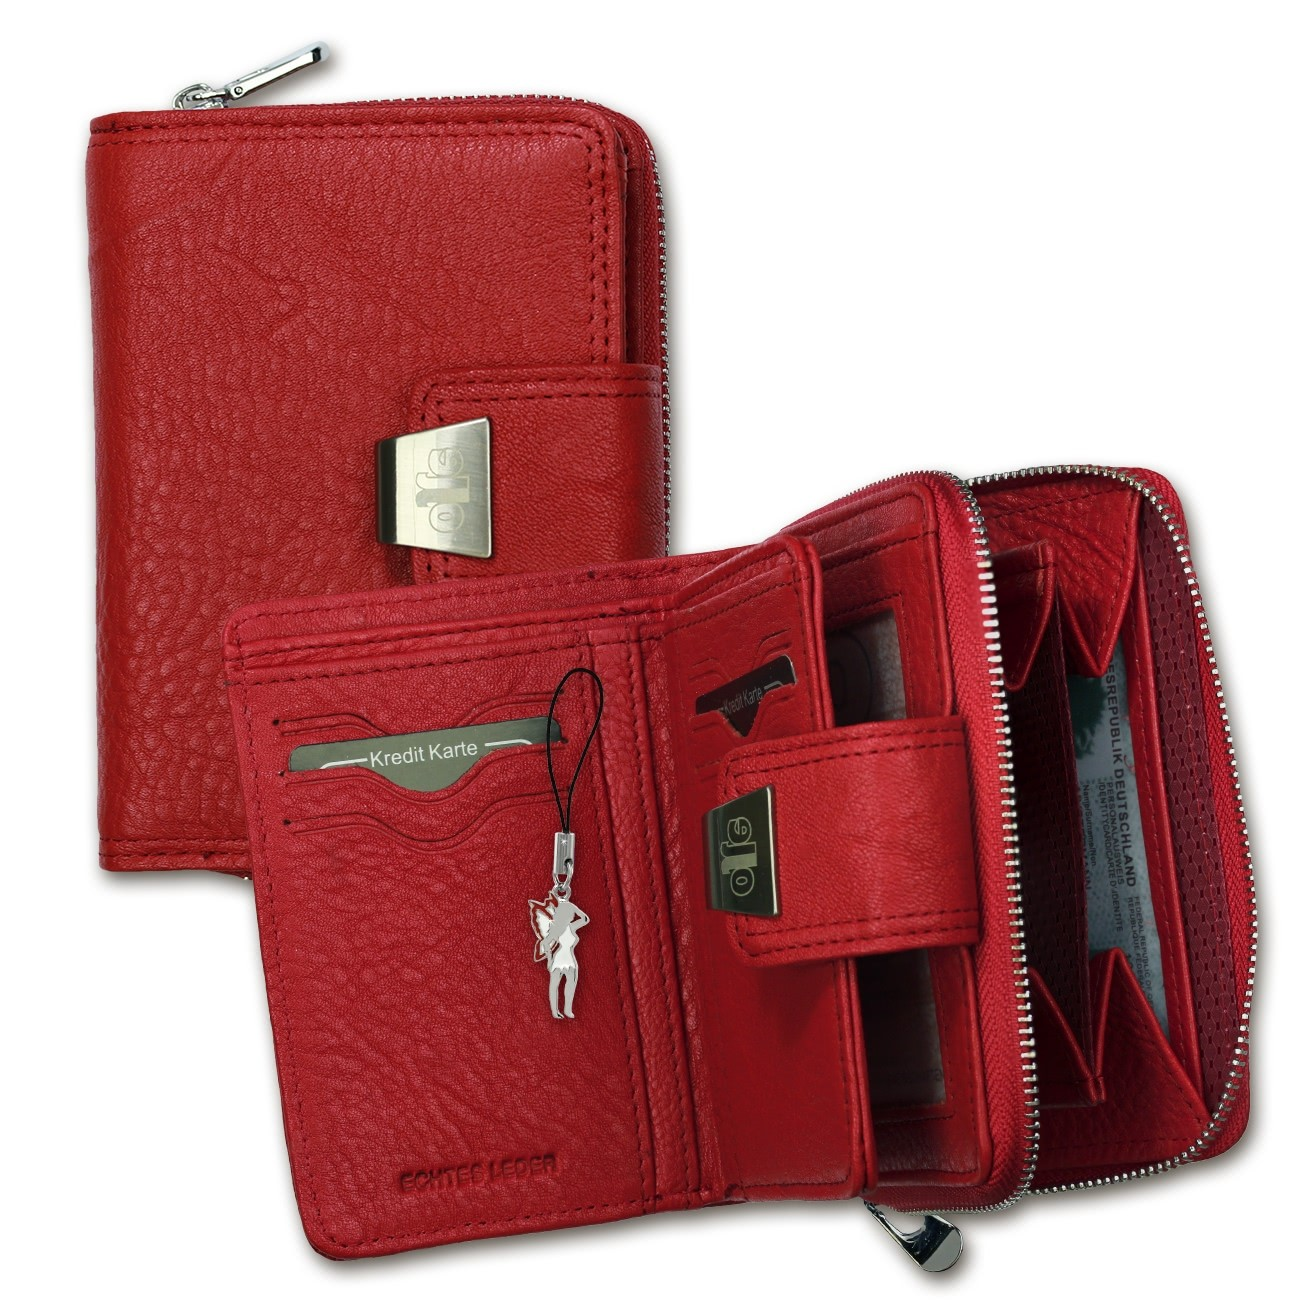 Geldbörse Leder rot Portemonnaie Hochformat Jennifer Jones OPJ708R